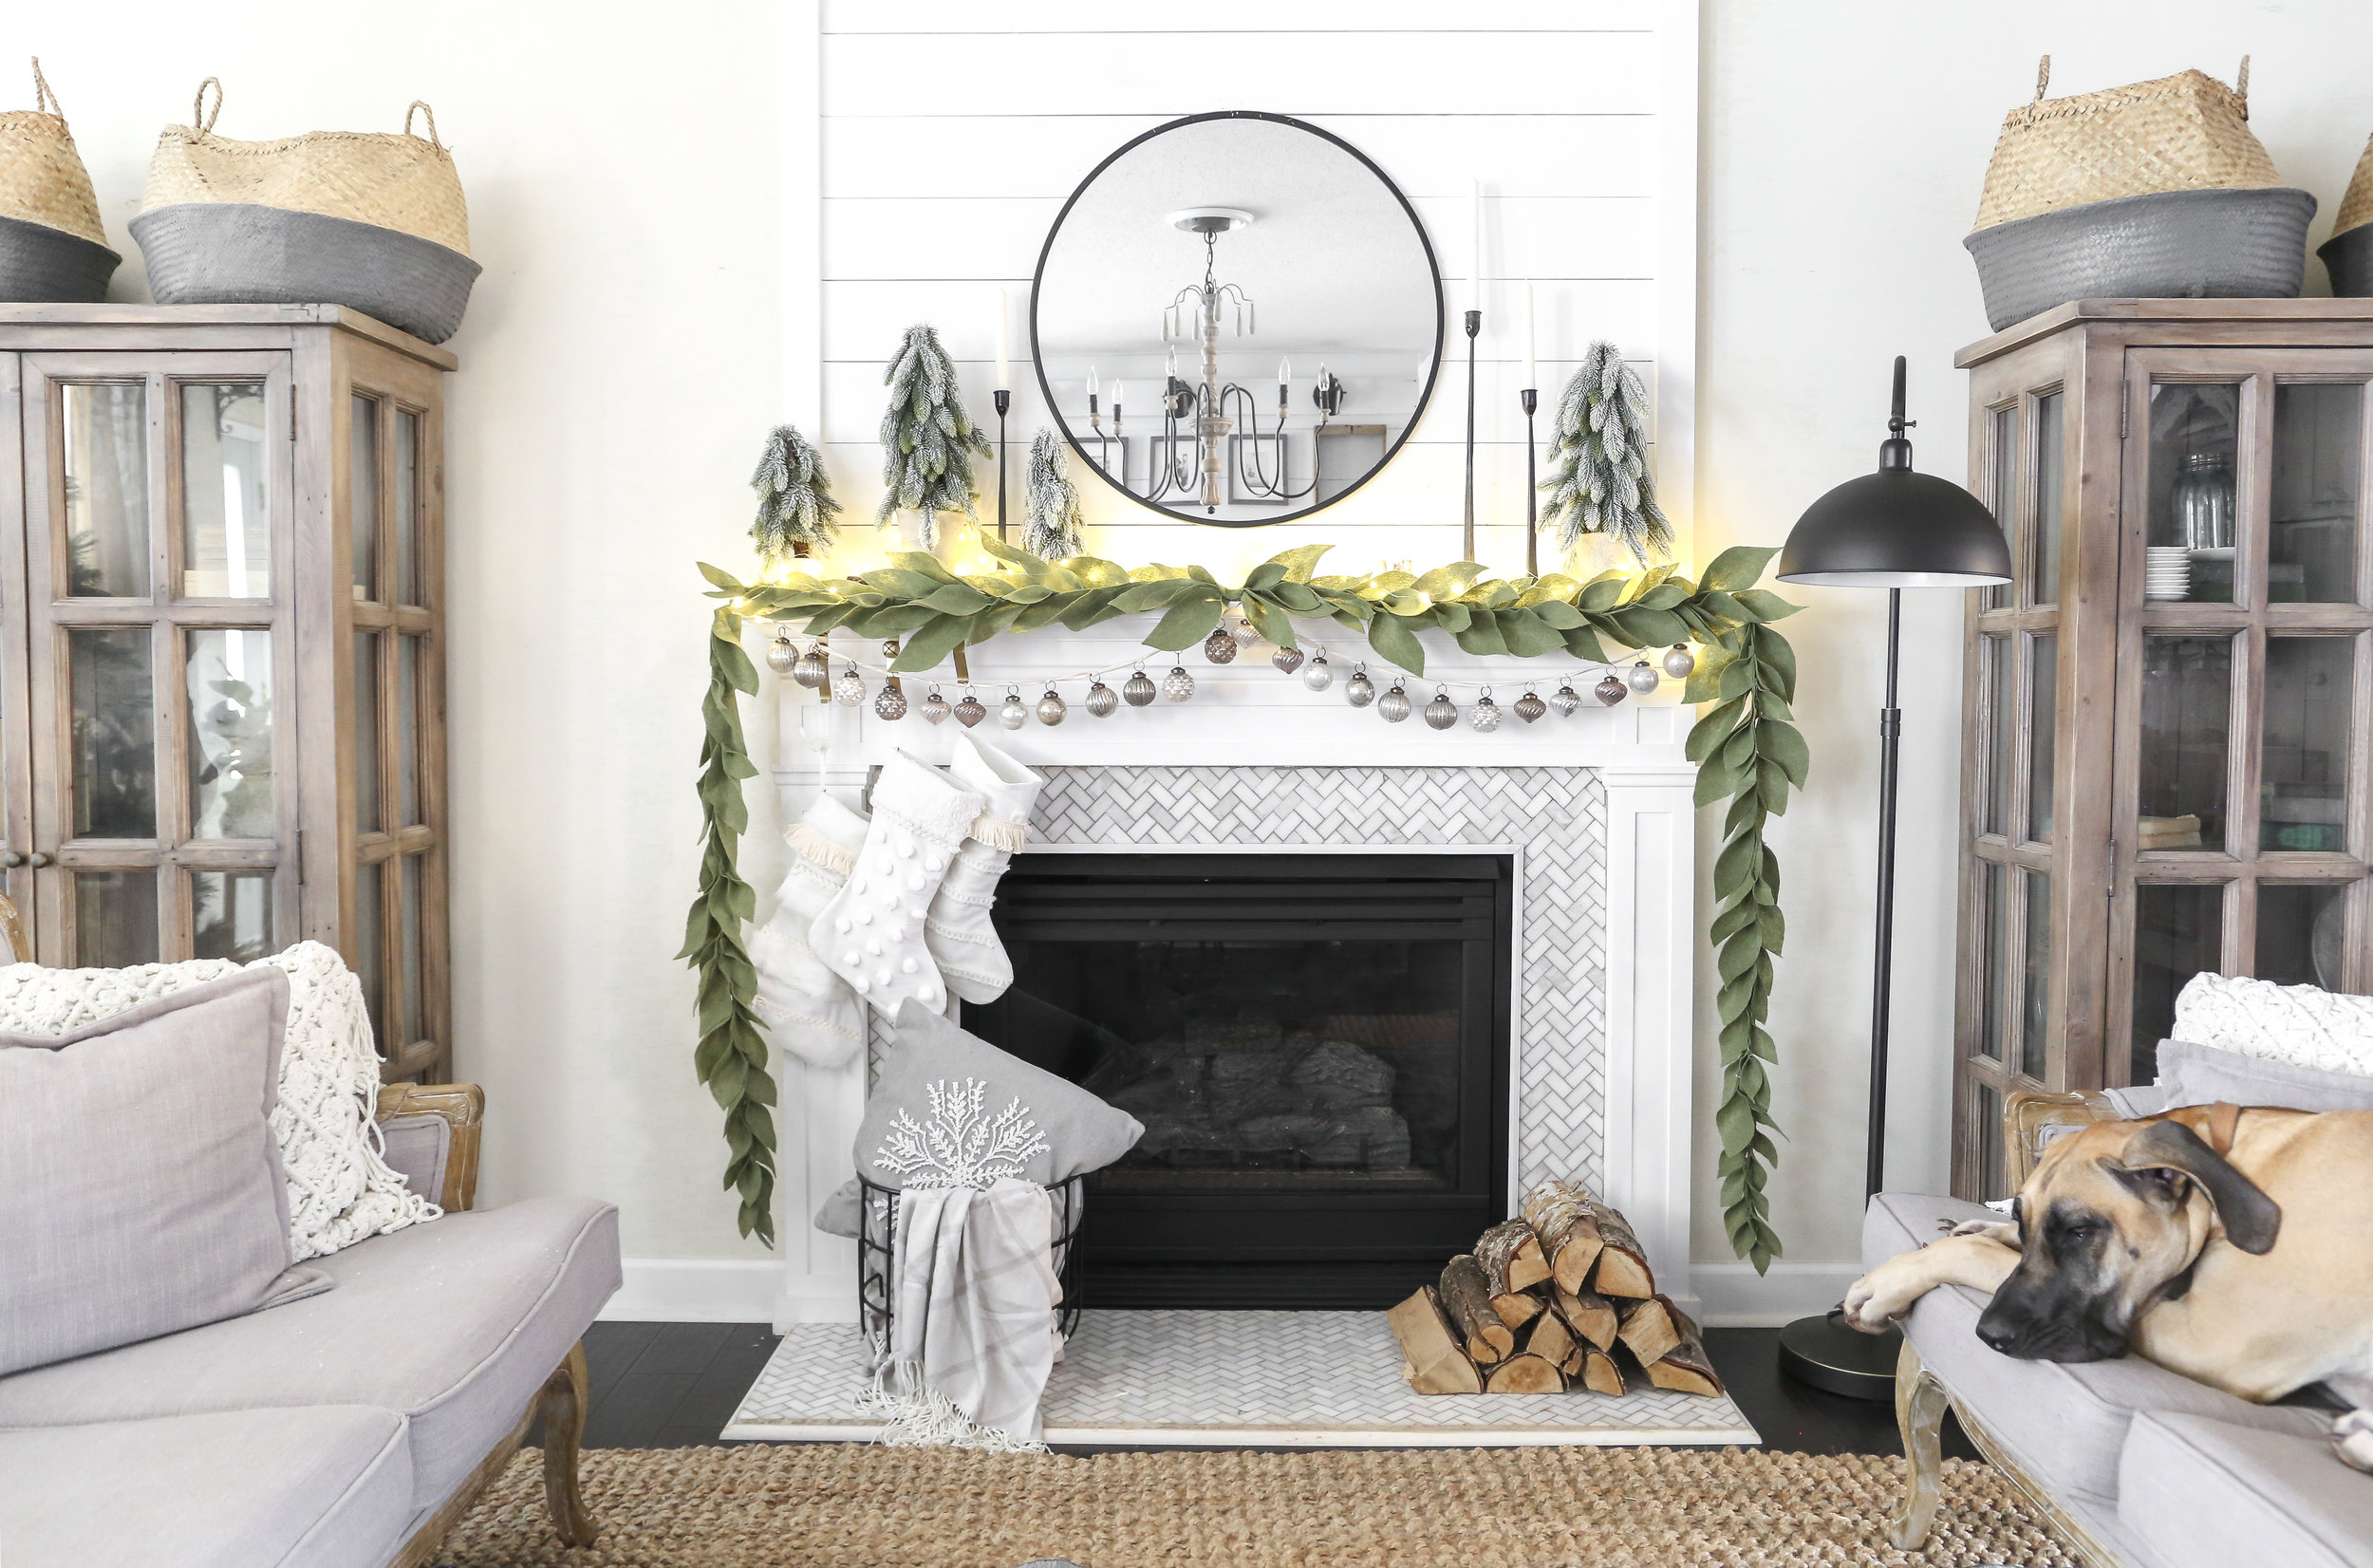 Plum Pretty Decor Design Co Simple Neutral Christmas Mantel With Joann